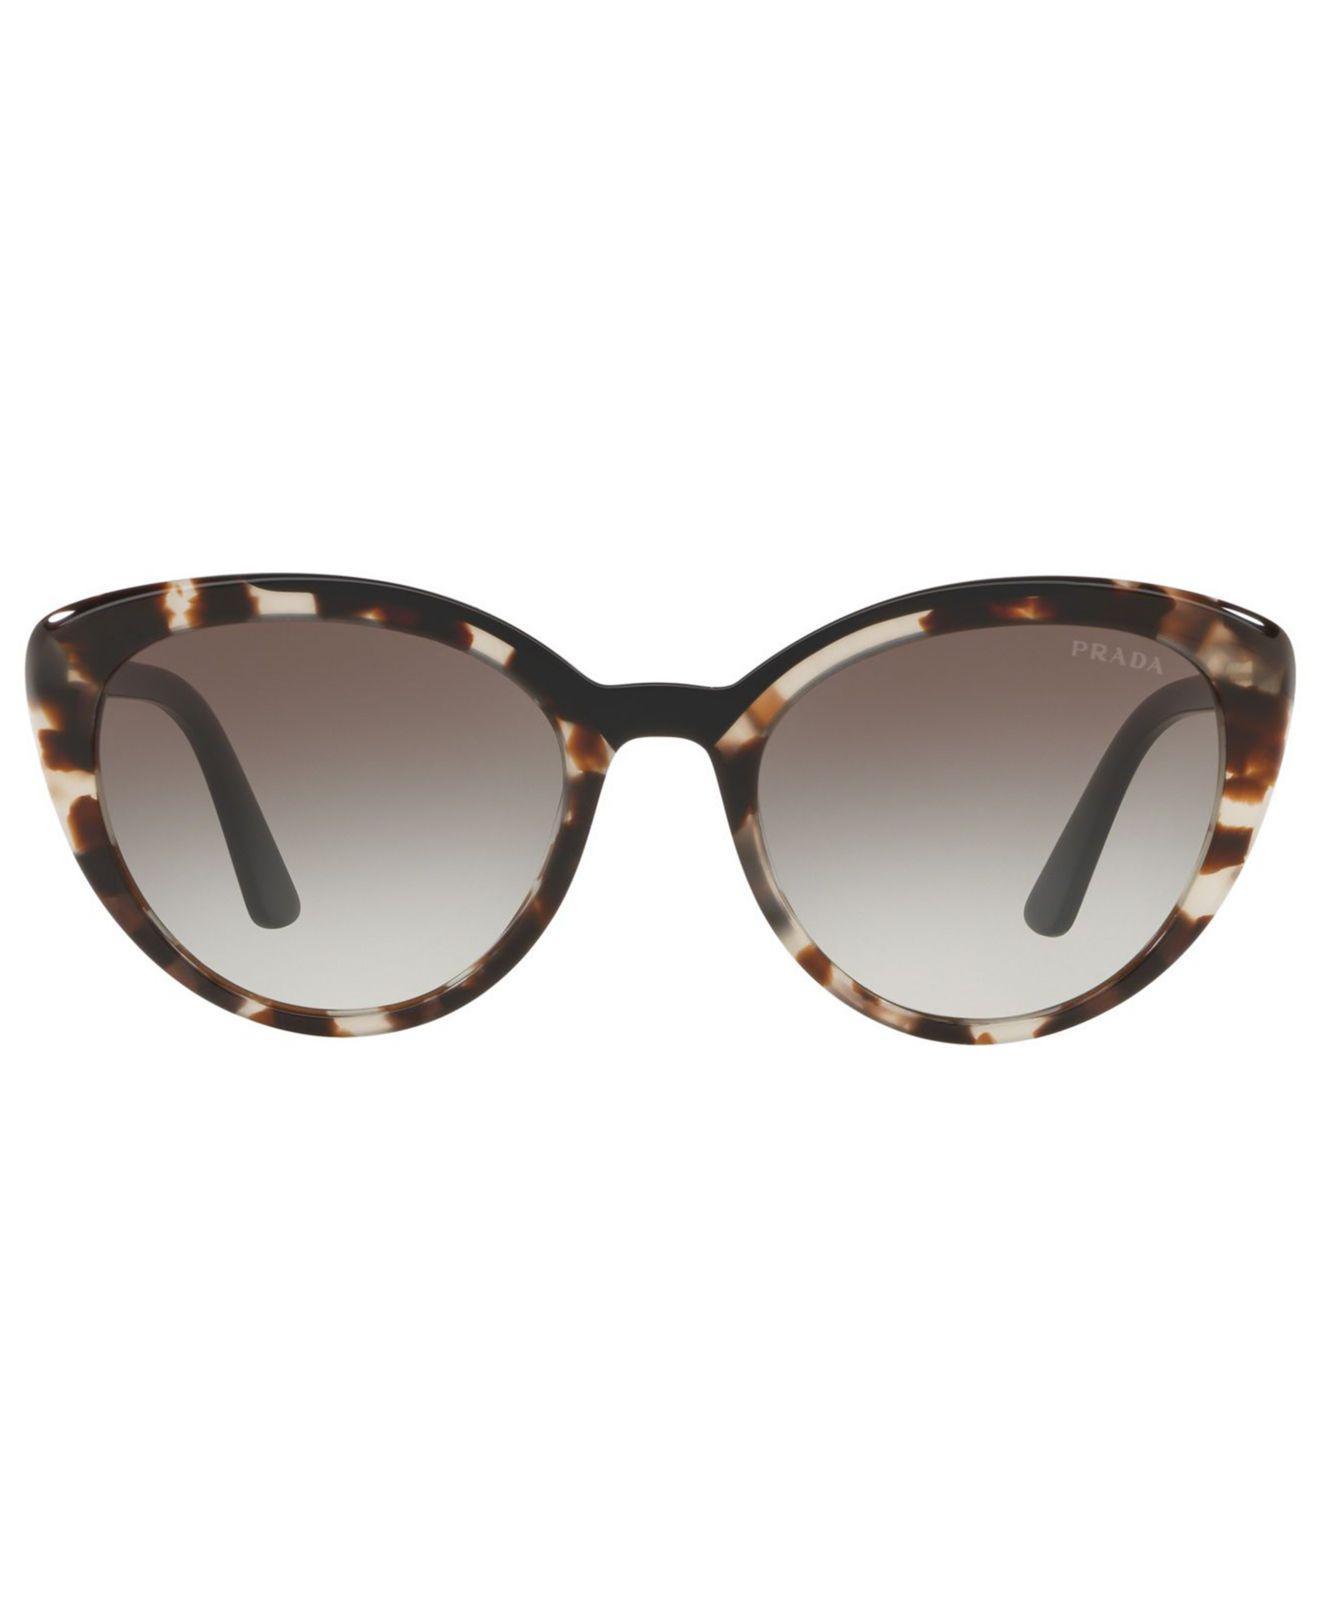 93319048cc44 Lyst - Prada 54mm Cat Eye Sunglasses - Opal Brown Gradient in Gray